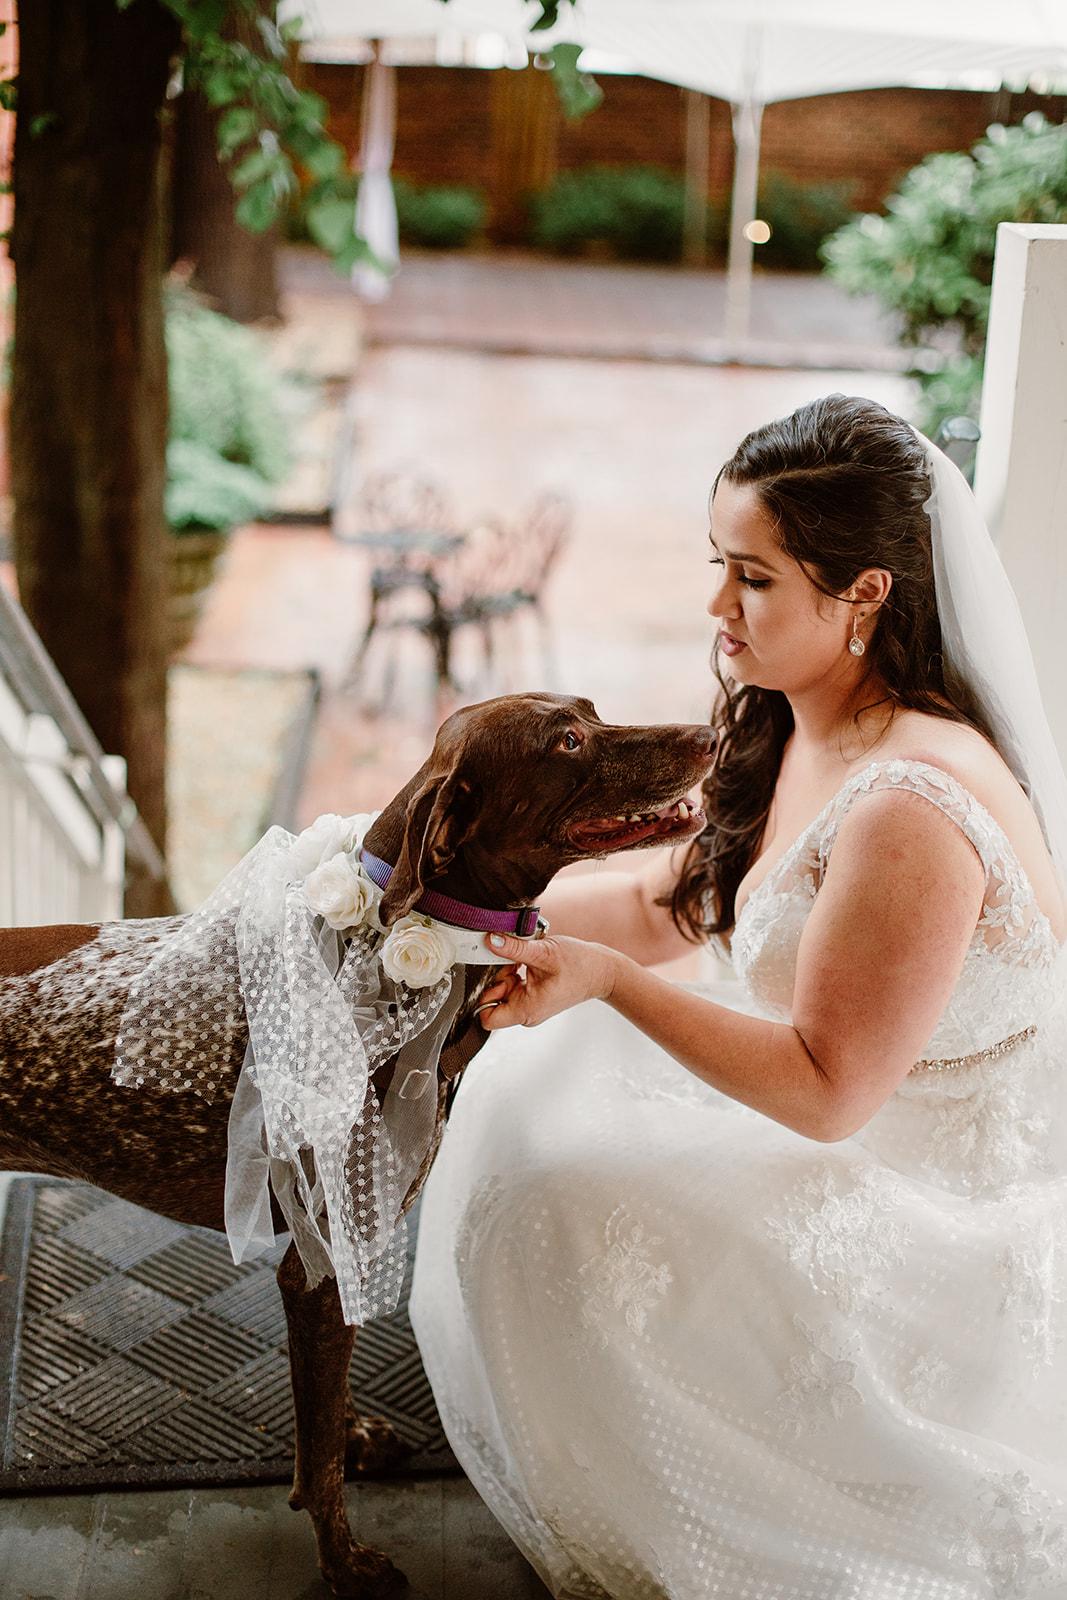 SarahMattozziPhotography-EmilyColin-LindenRowInnWedding-WeddingParty-5.jpg